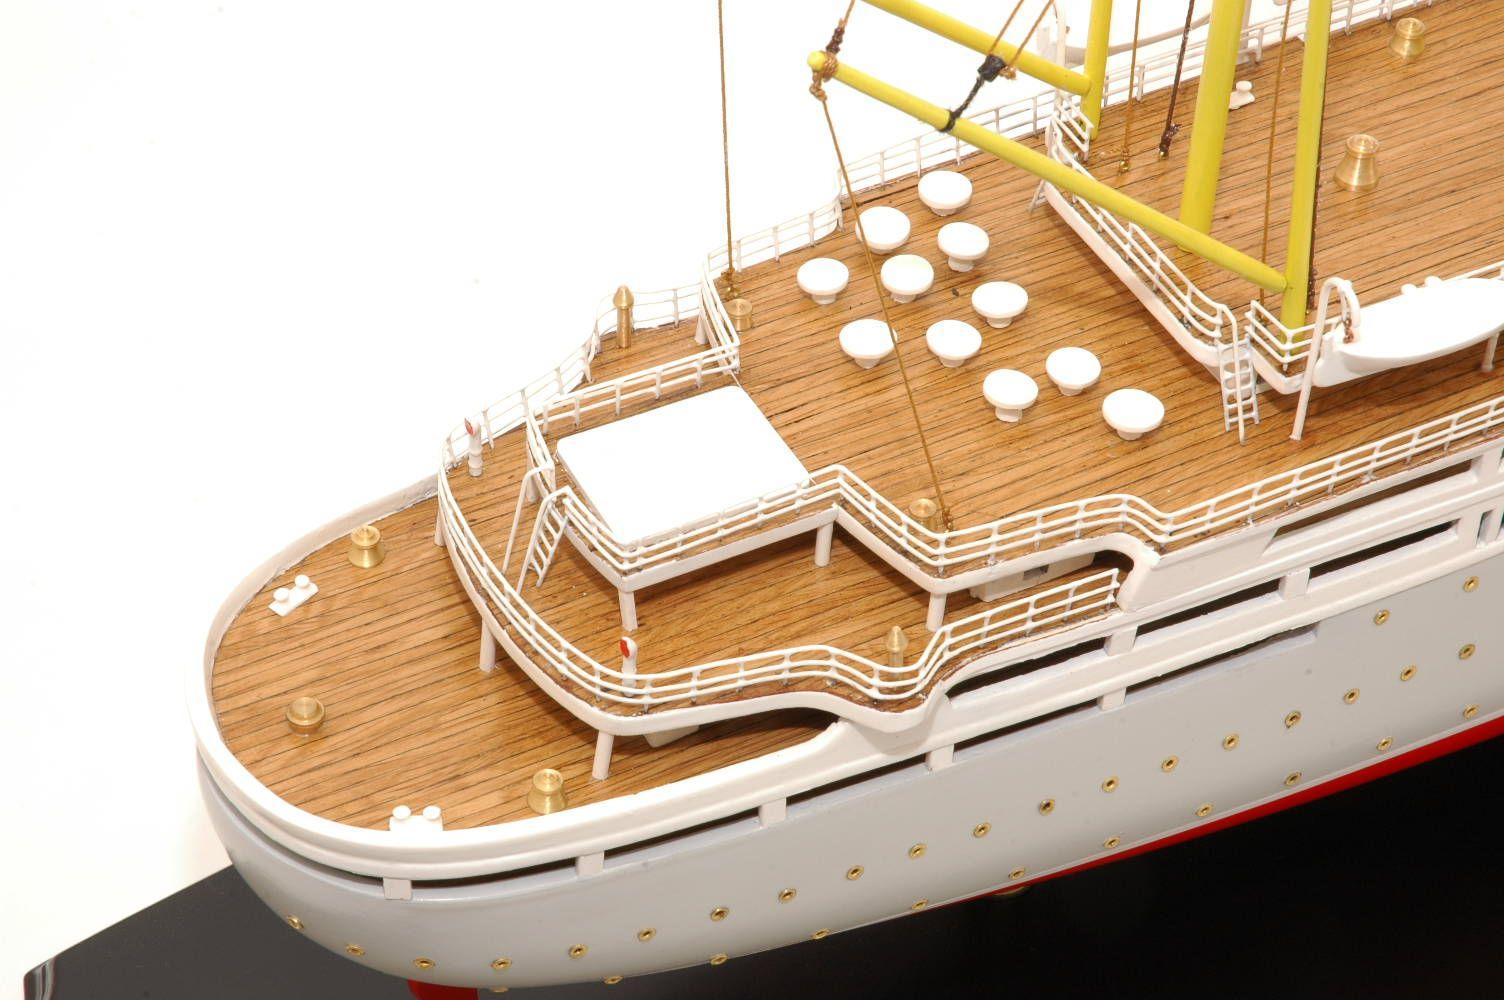 549-6436-Bergensfjord-model-ship